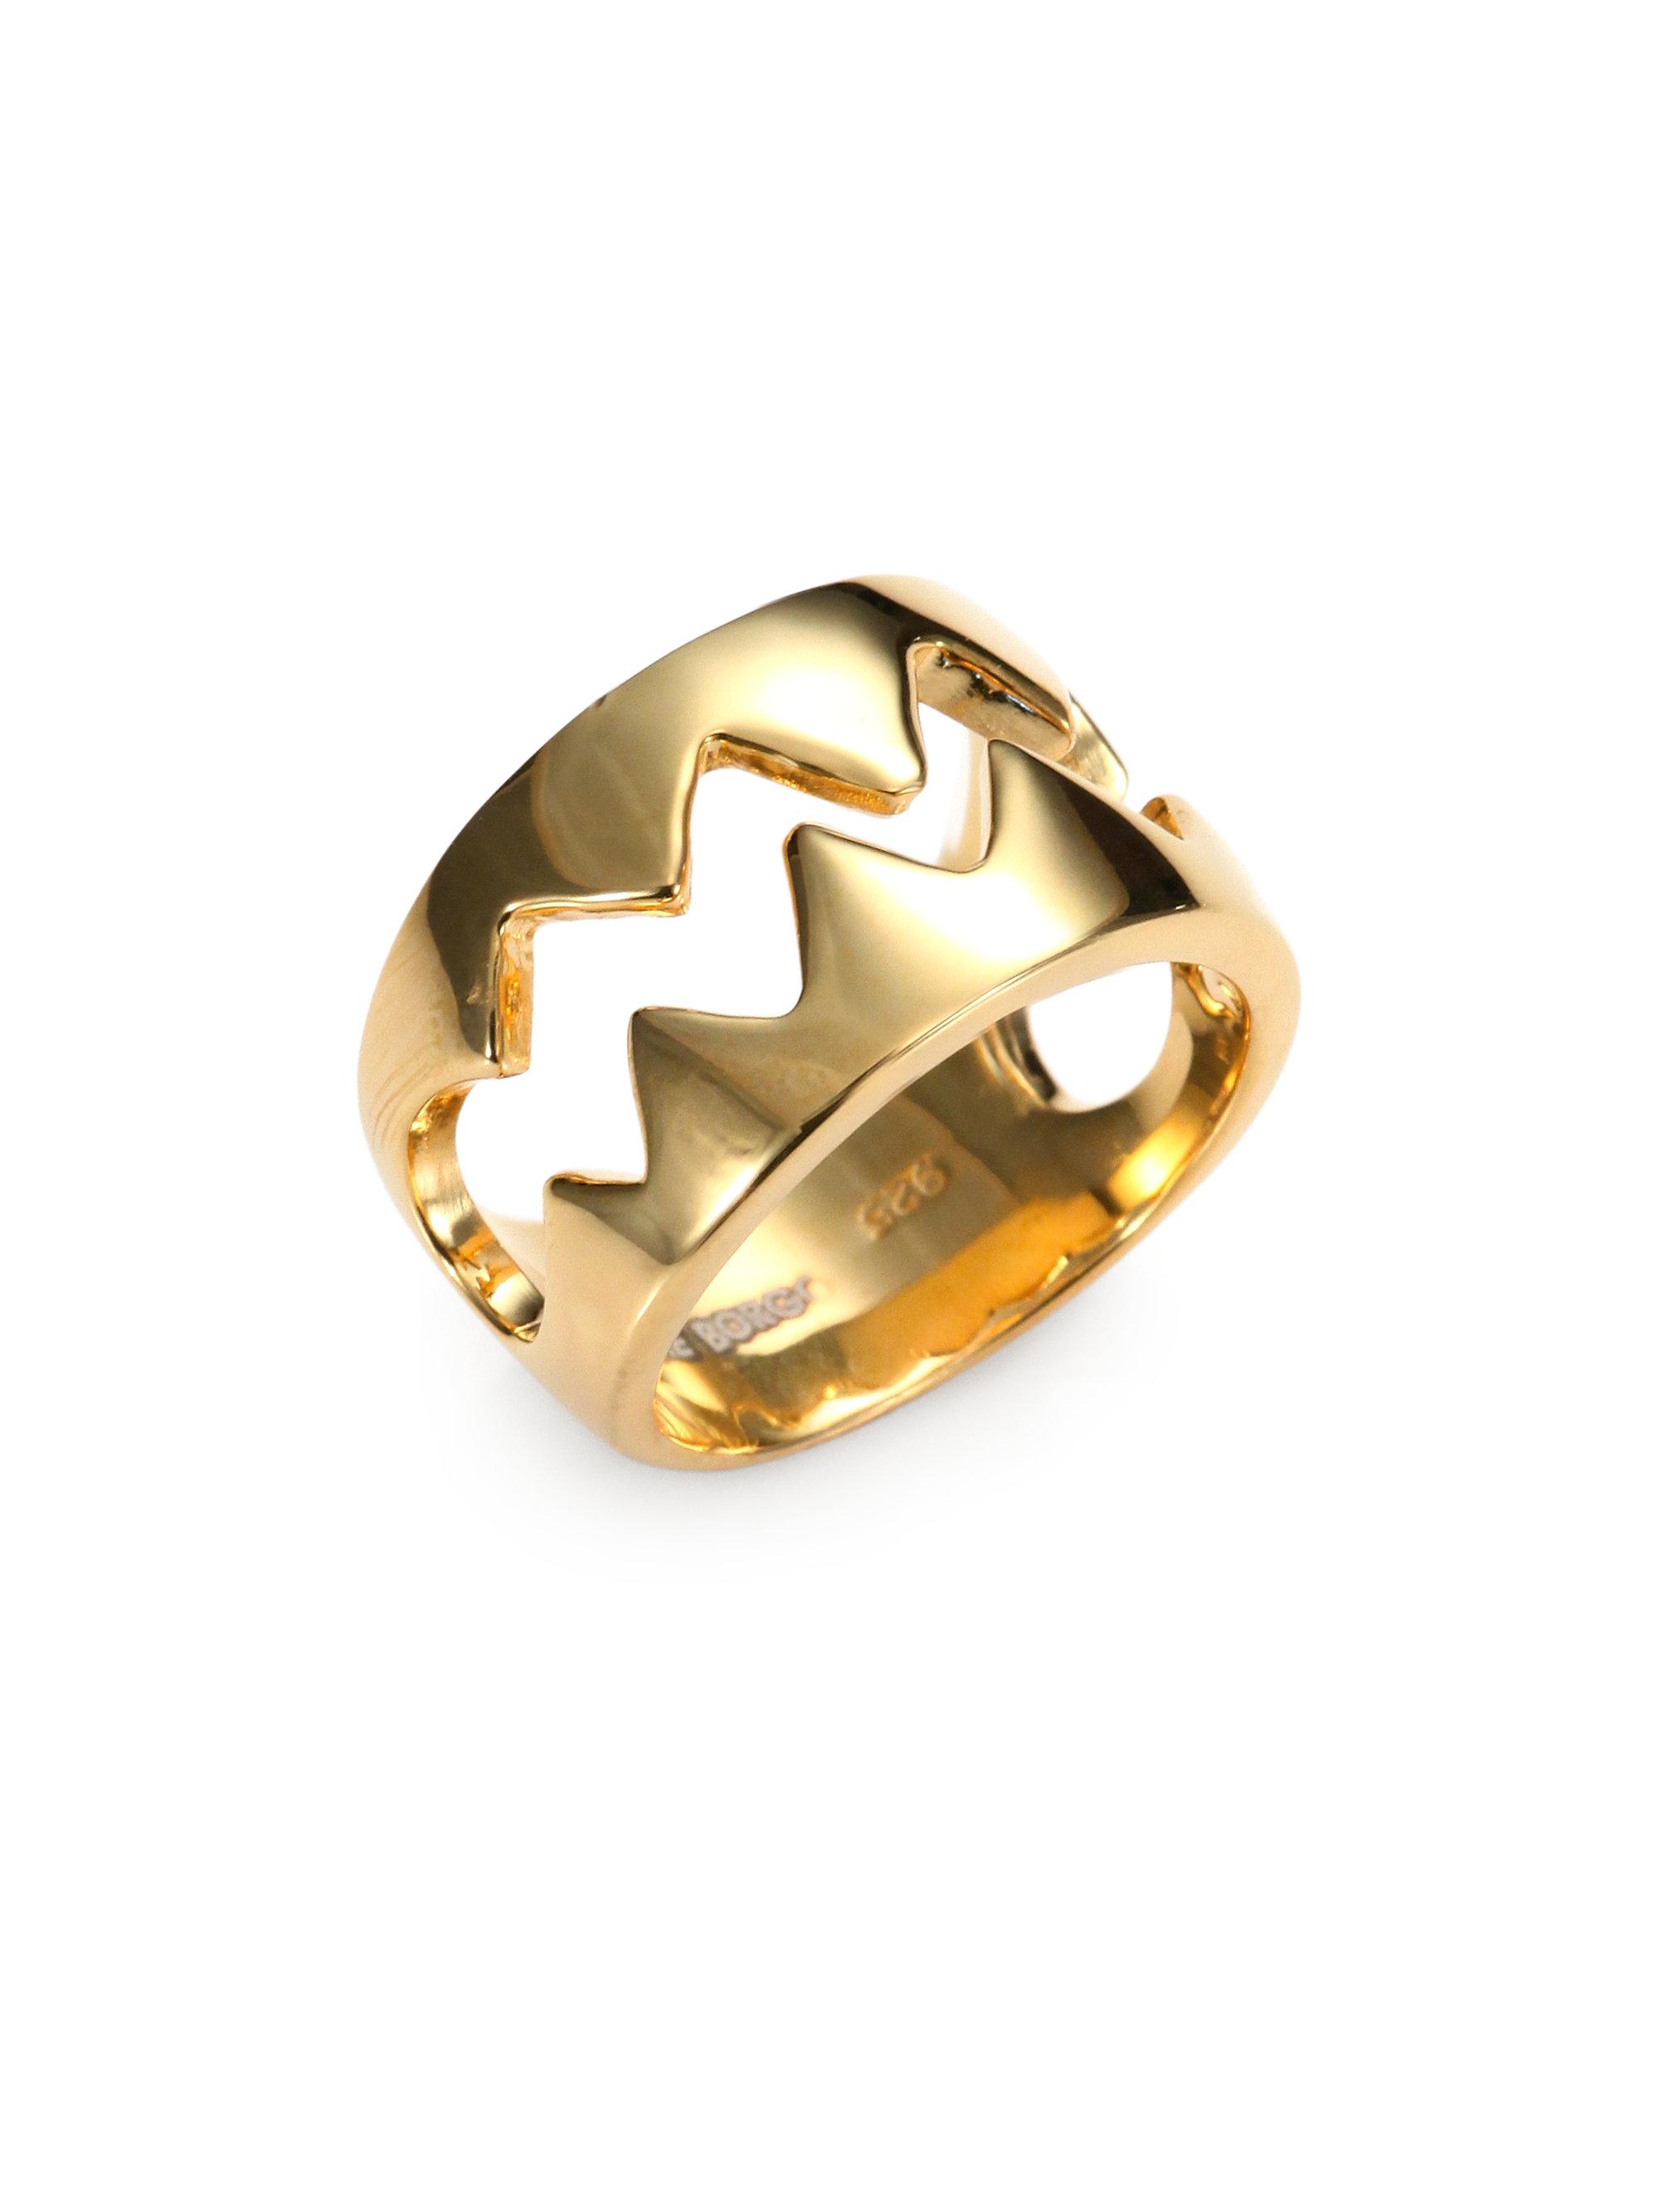 7b47277c4d57 Lyst - Eddie Borgo Bear Trap Ring in Metallic